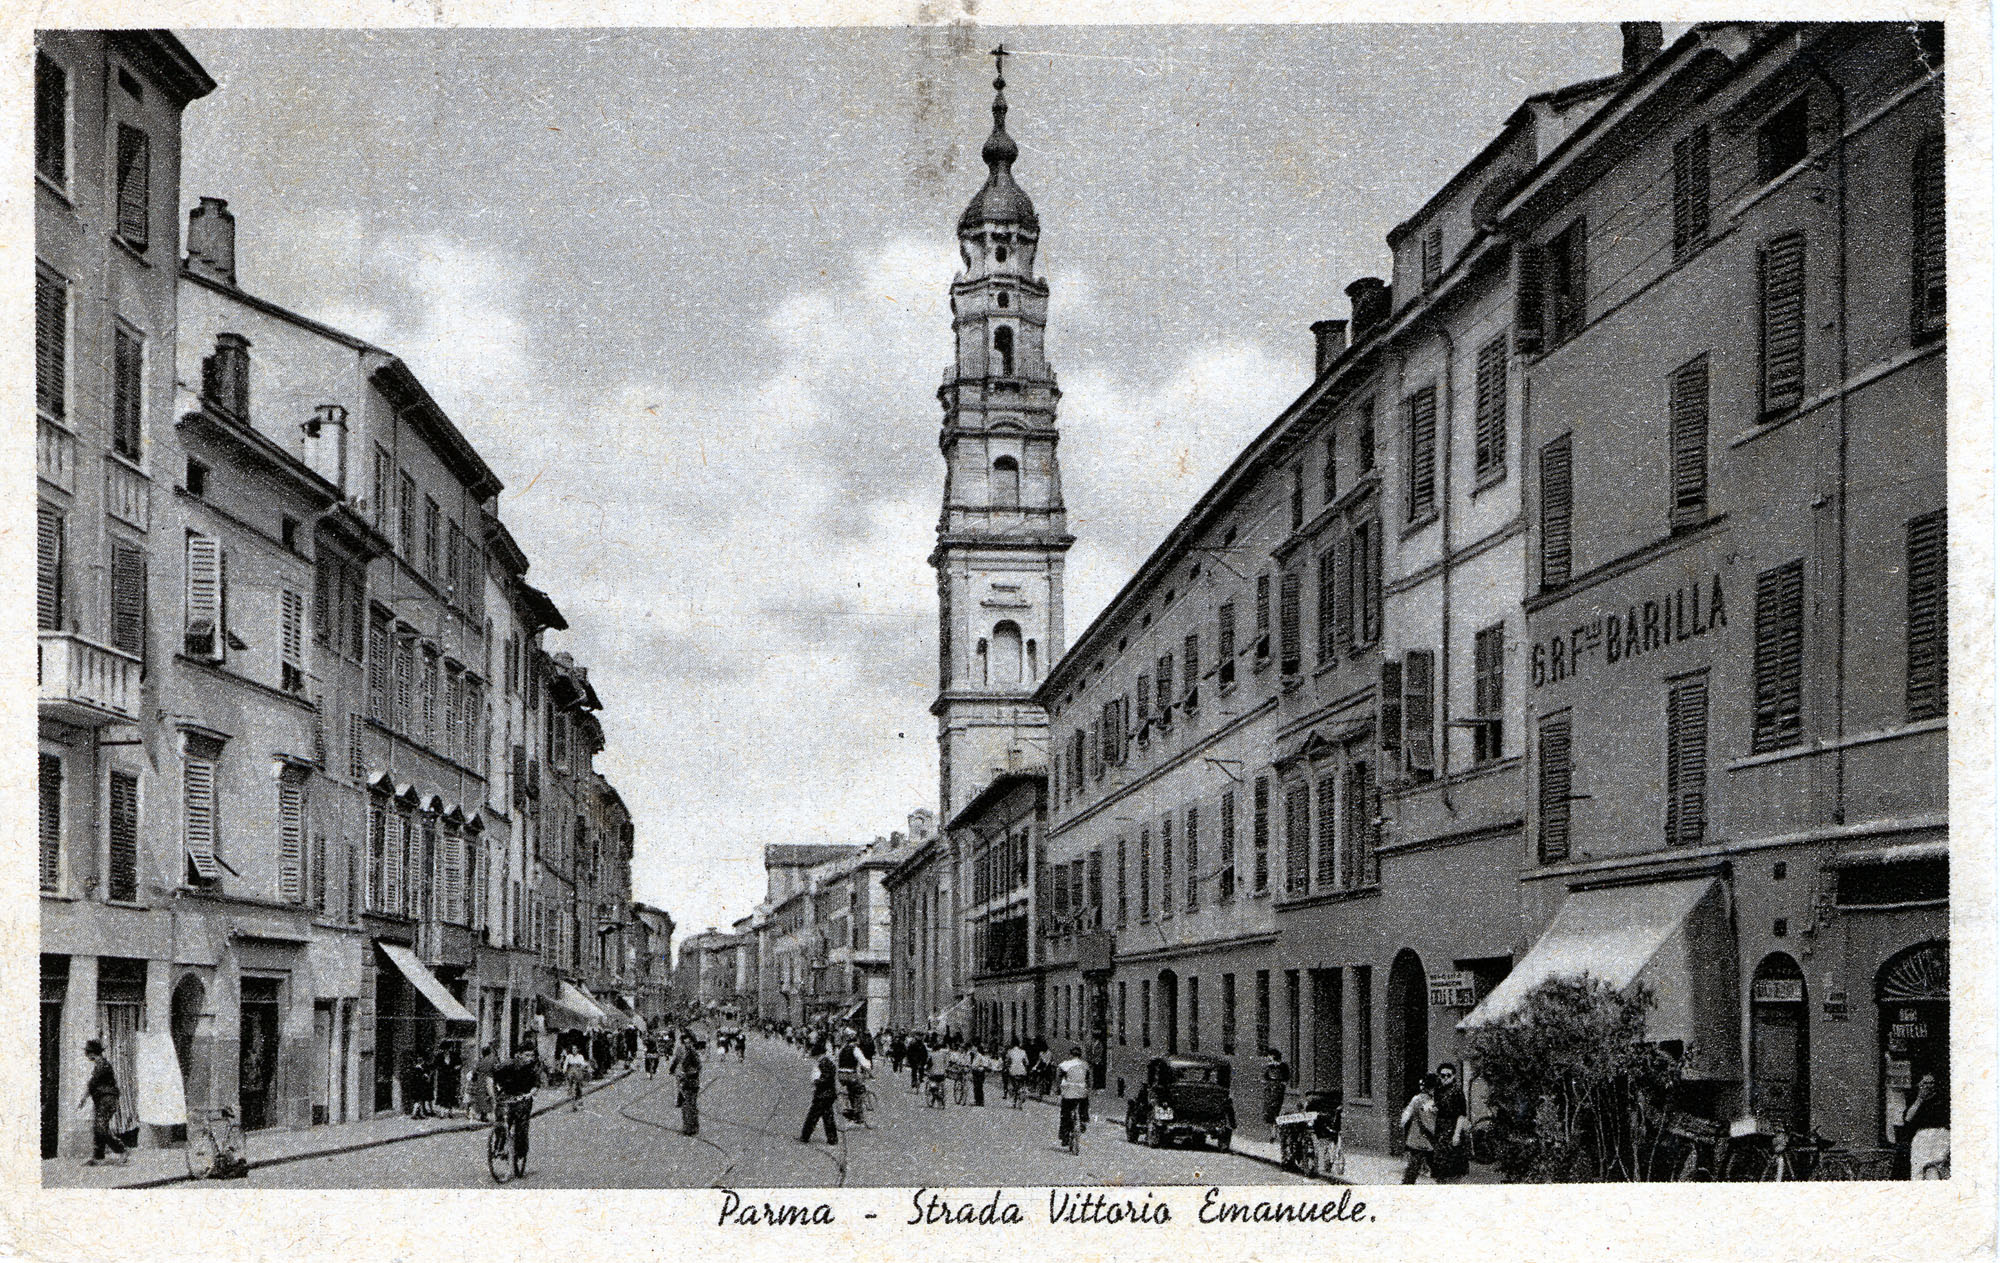 1877 - Barilla shop in Vittorio Emanuele street